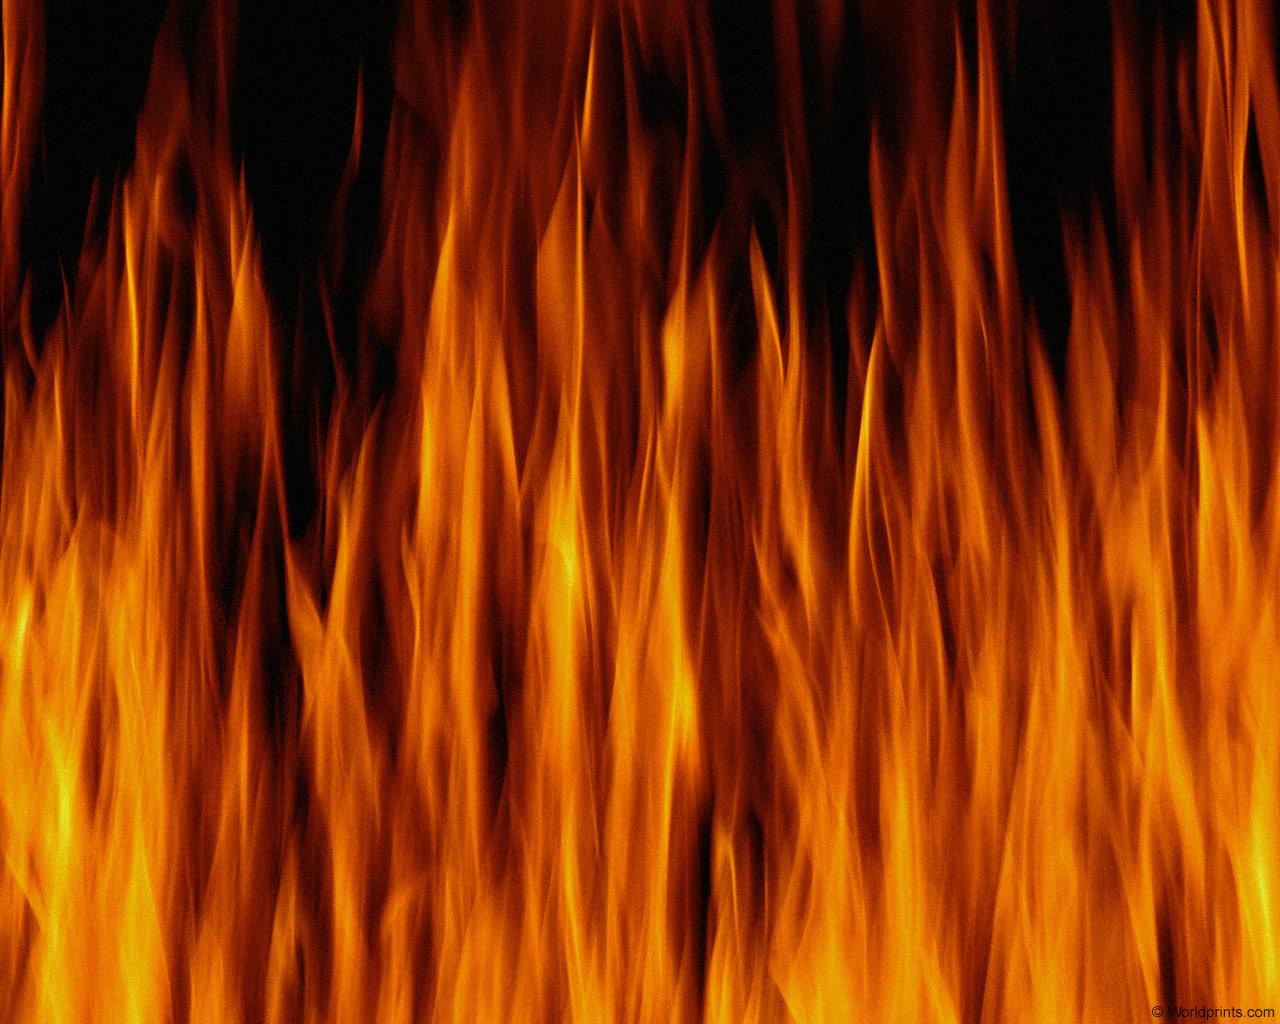 Fire Flames Photos Textures Gallery.